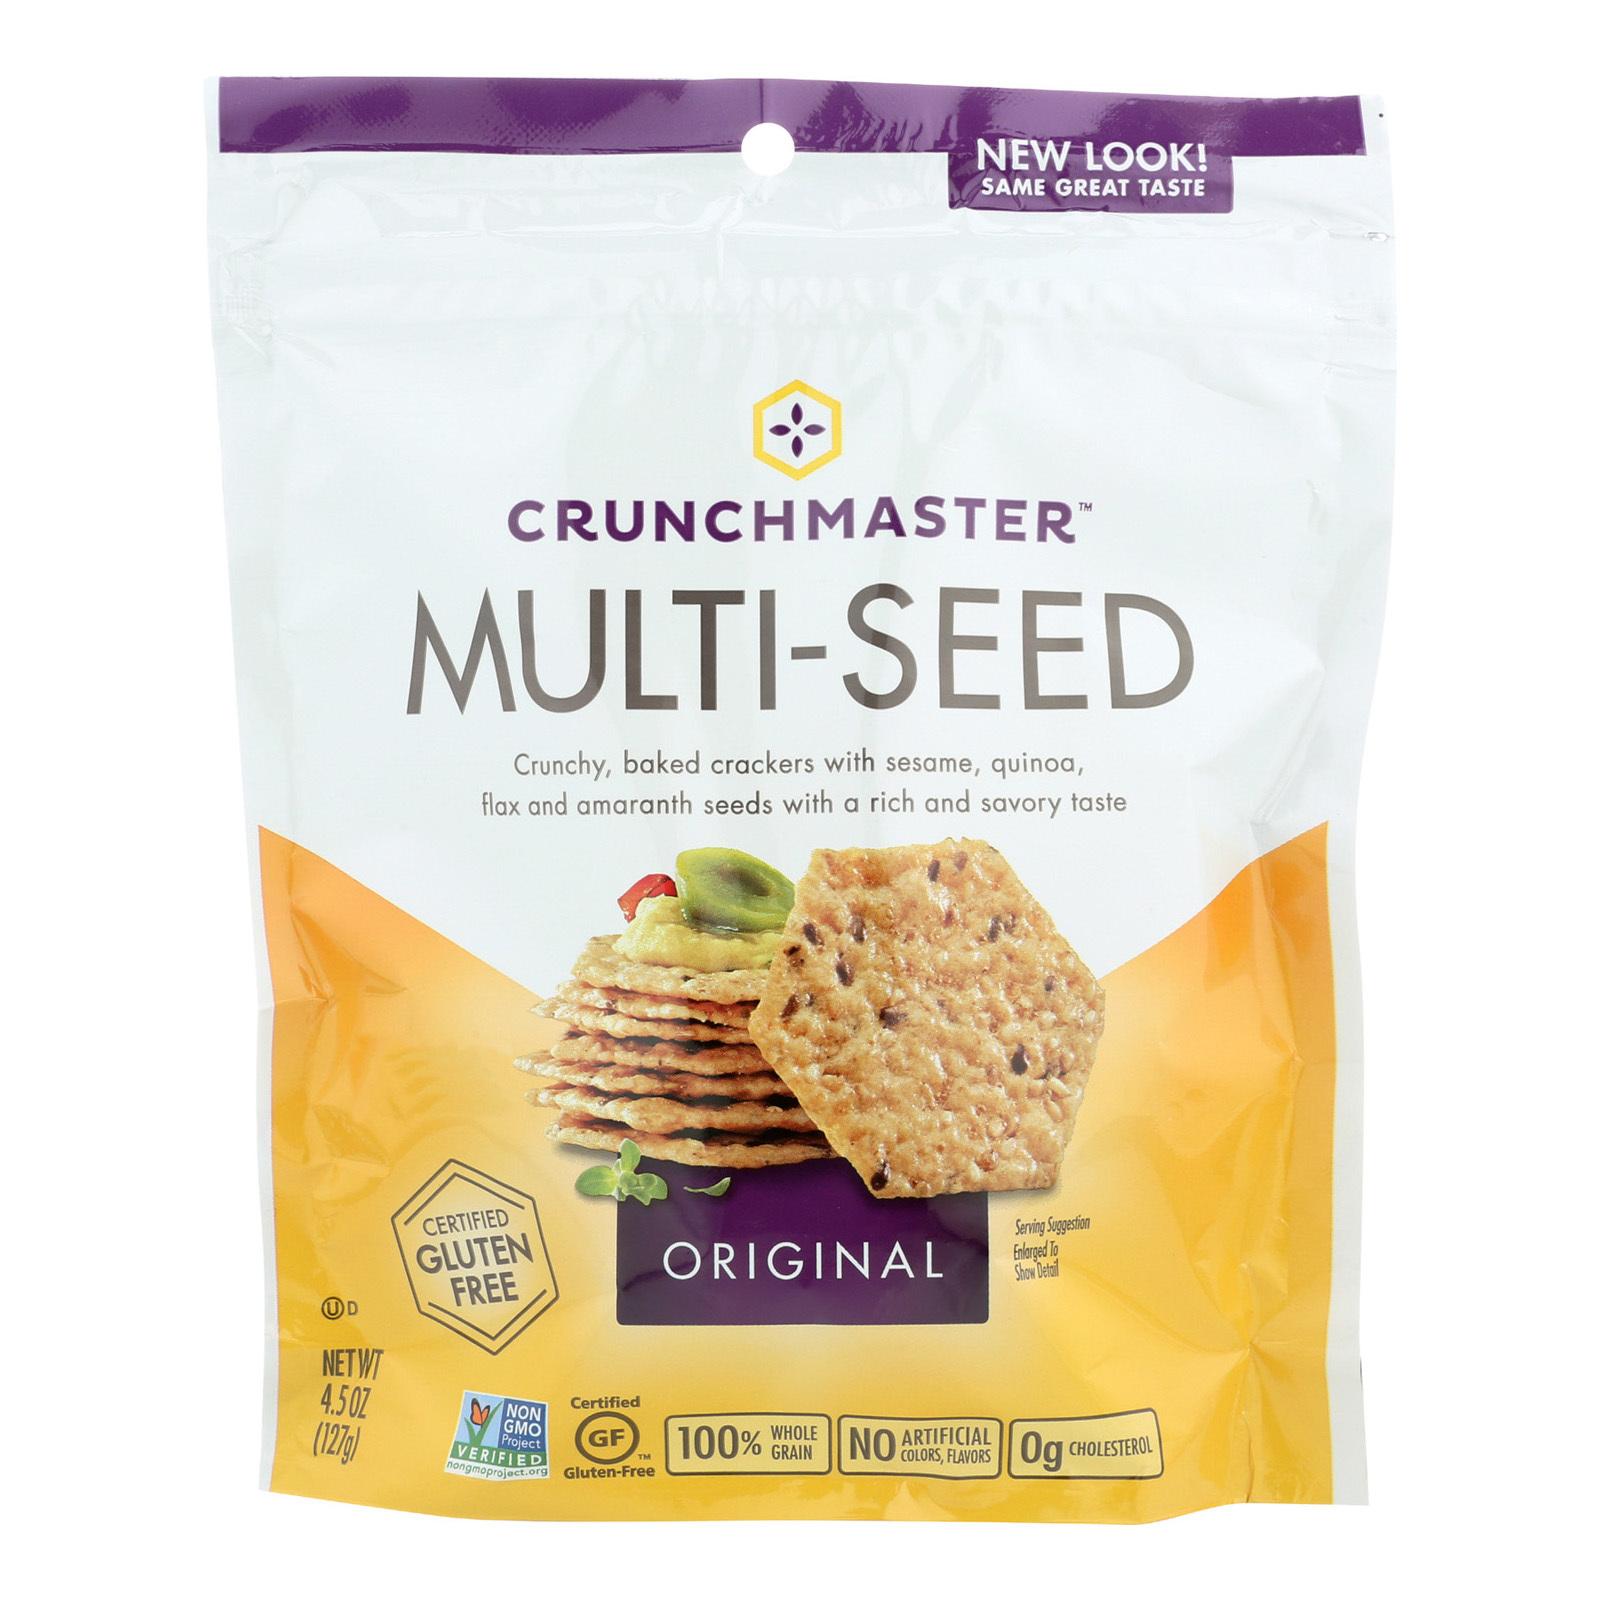 Crunchmaster Multi-Seed Crackers - Original - Case of 12 - 4.5 oz.